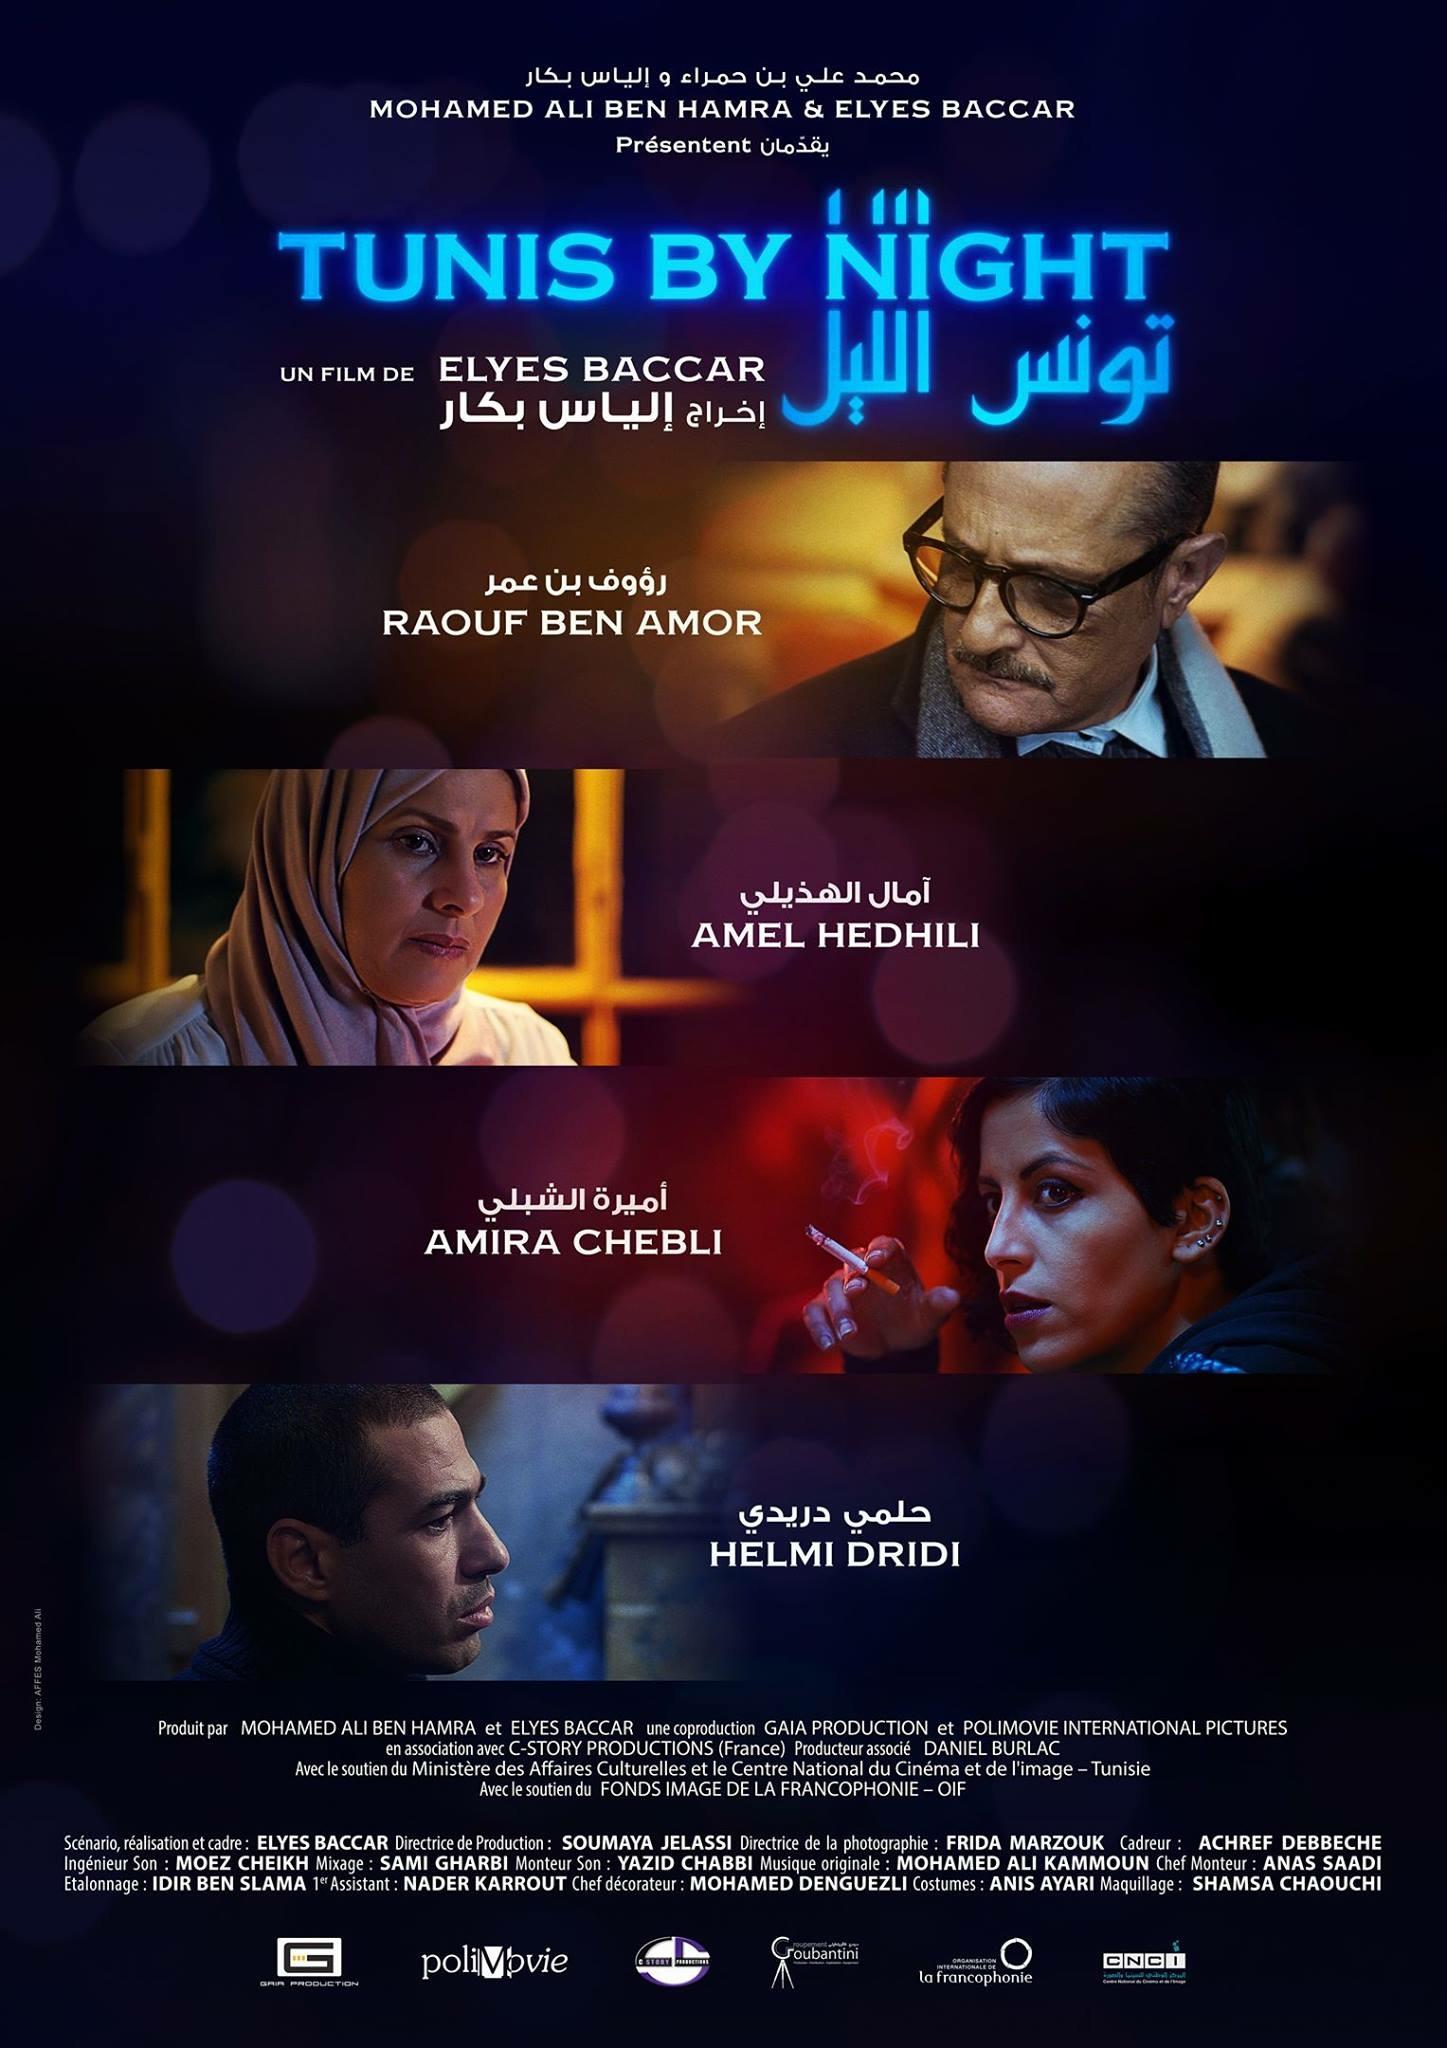 [فيلم][تورنت][تحميل][تونس بالليل][2017][1080p][Web-DL][تونسي] 1 arabp2p.com